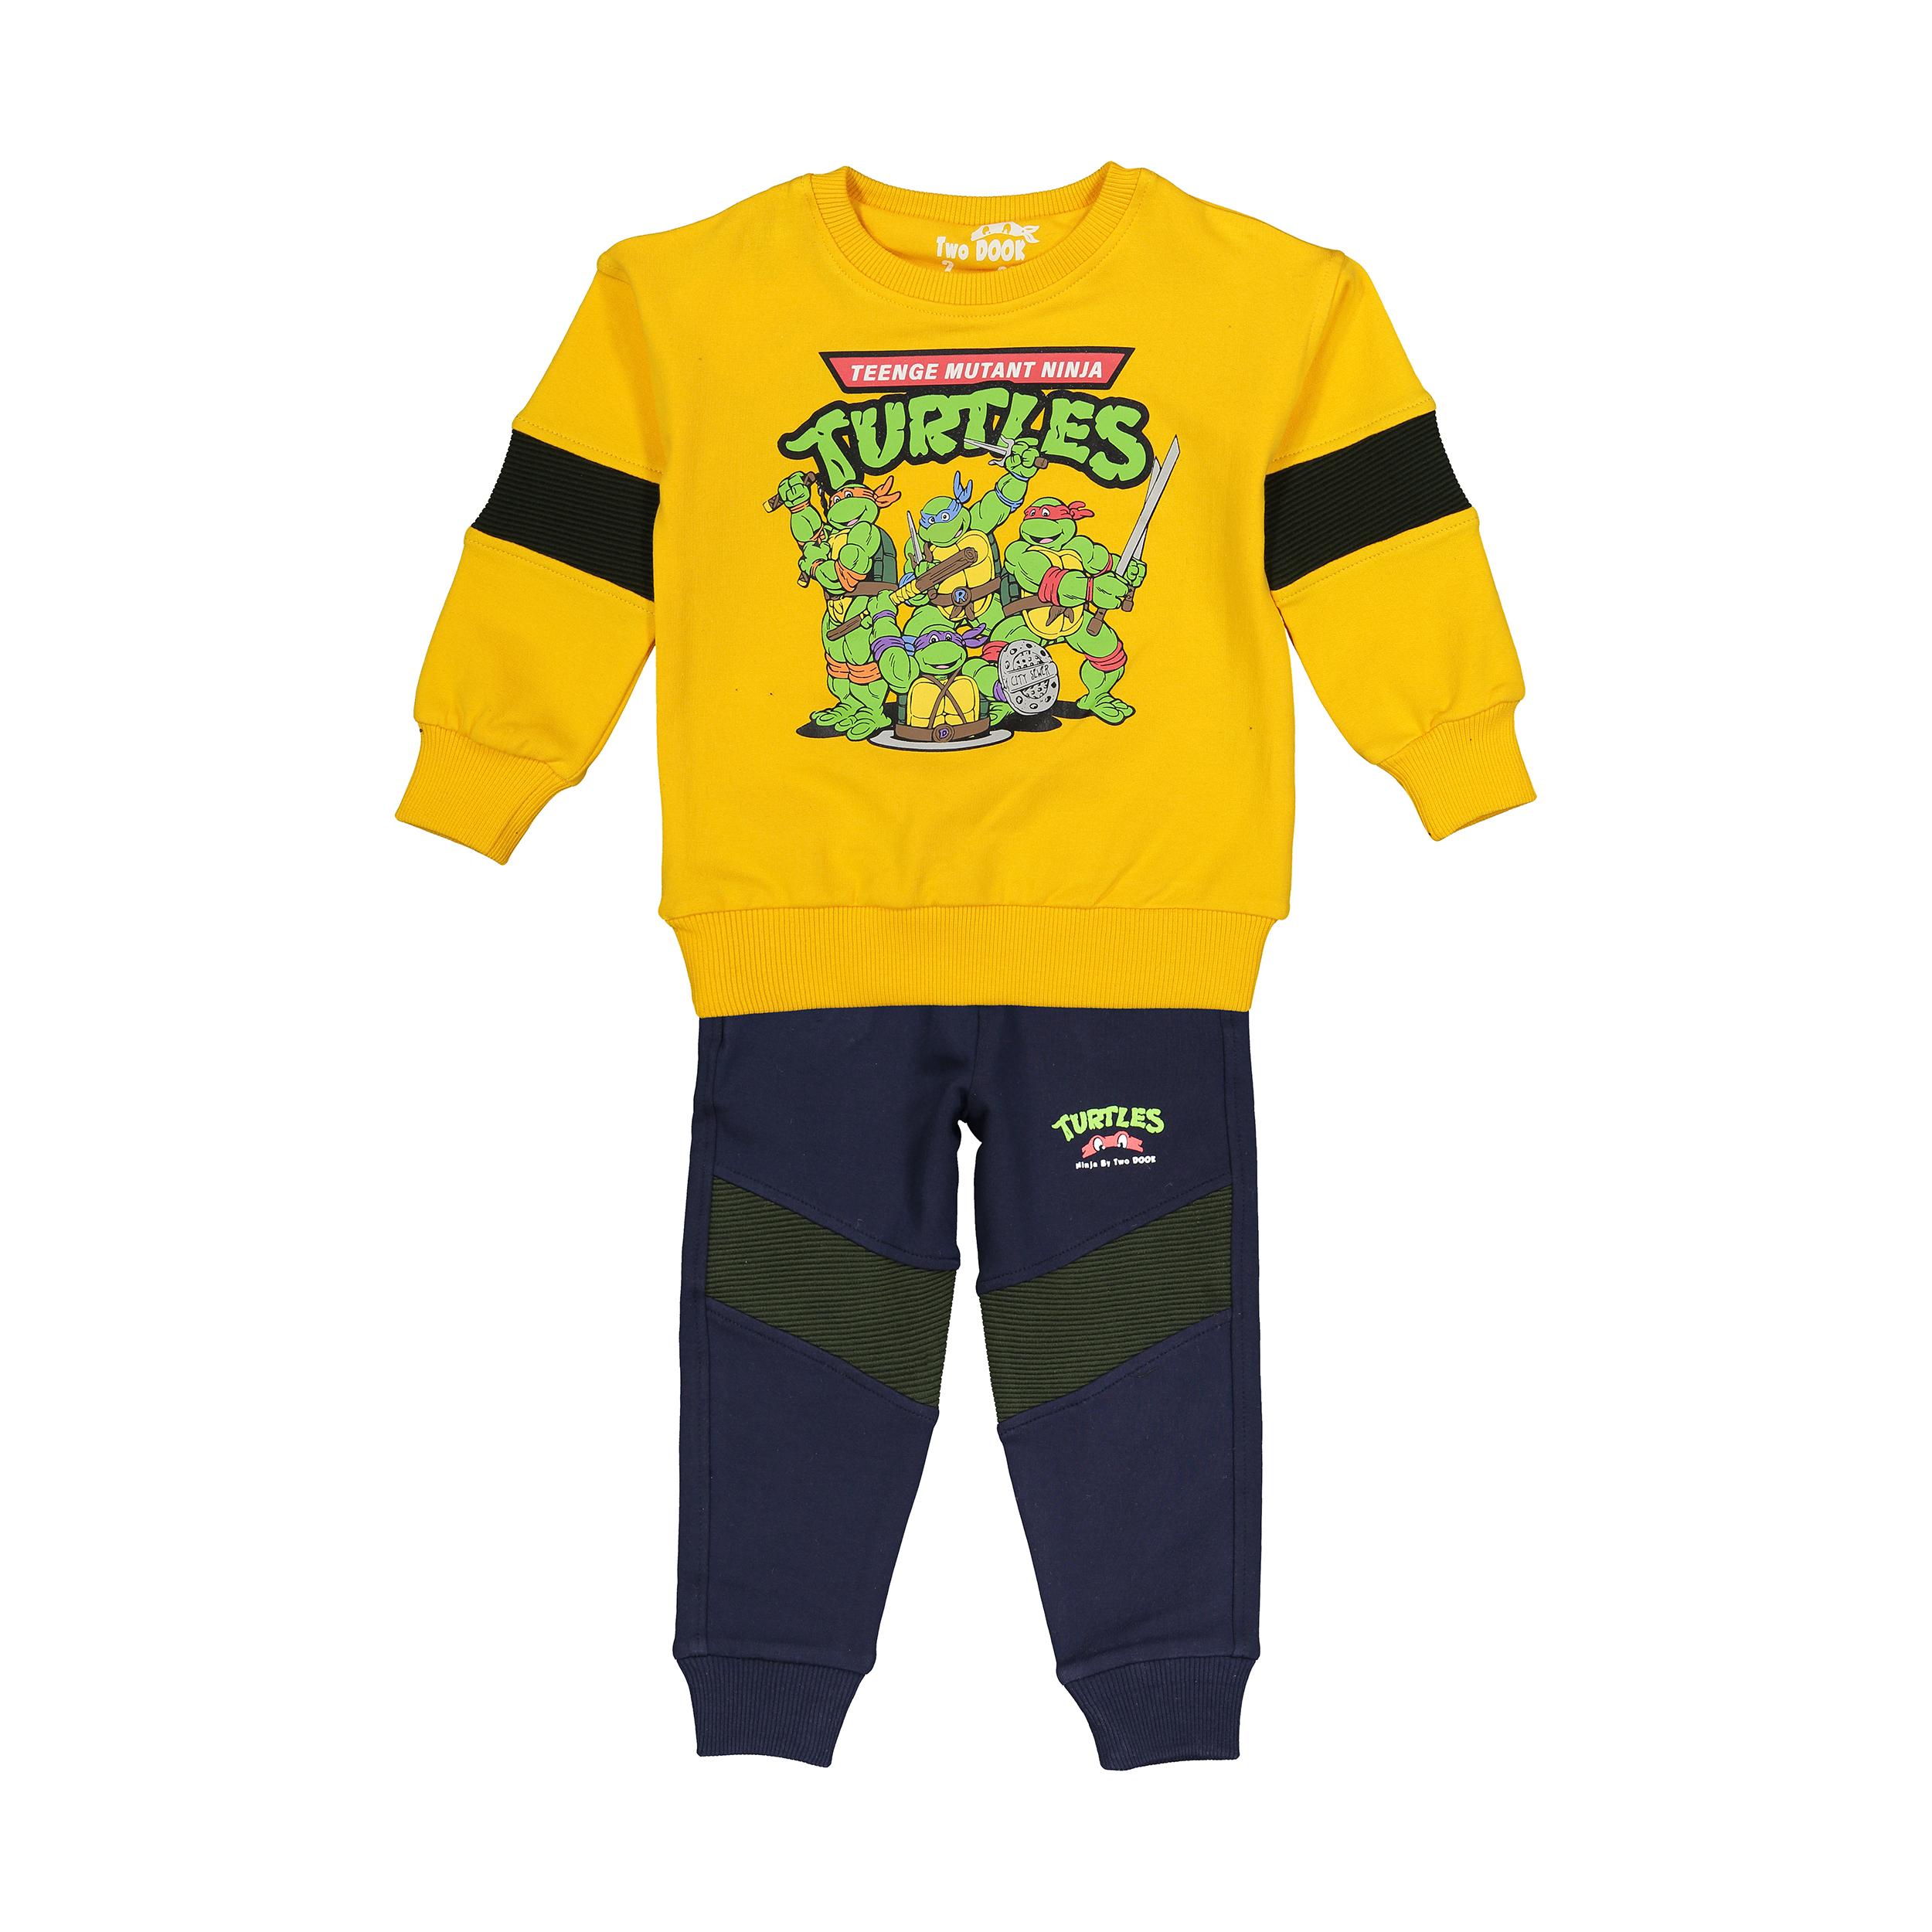 ست سویشرت و شلوار نوزادی تودوک مدل 2151117-16